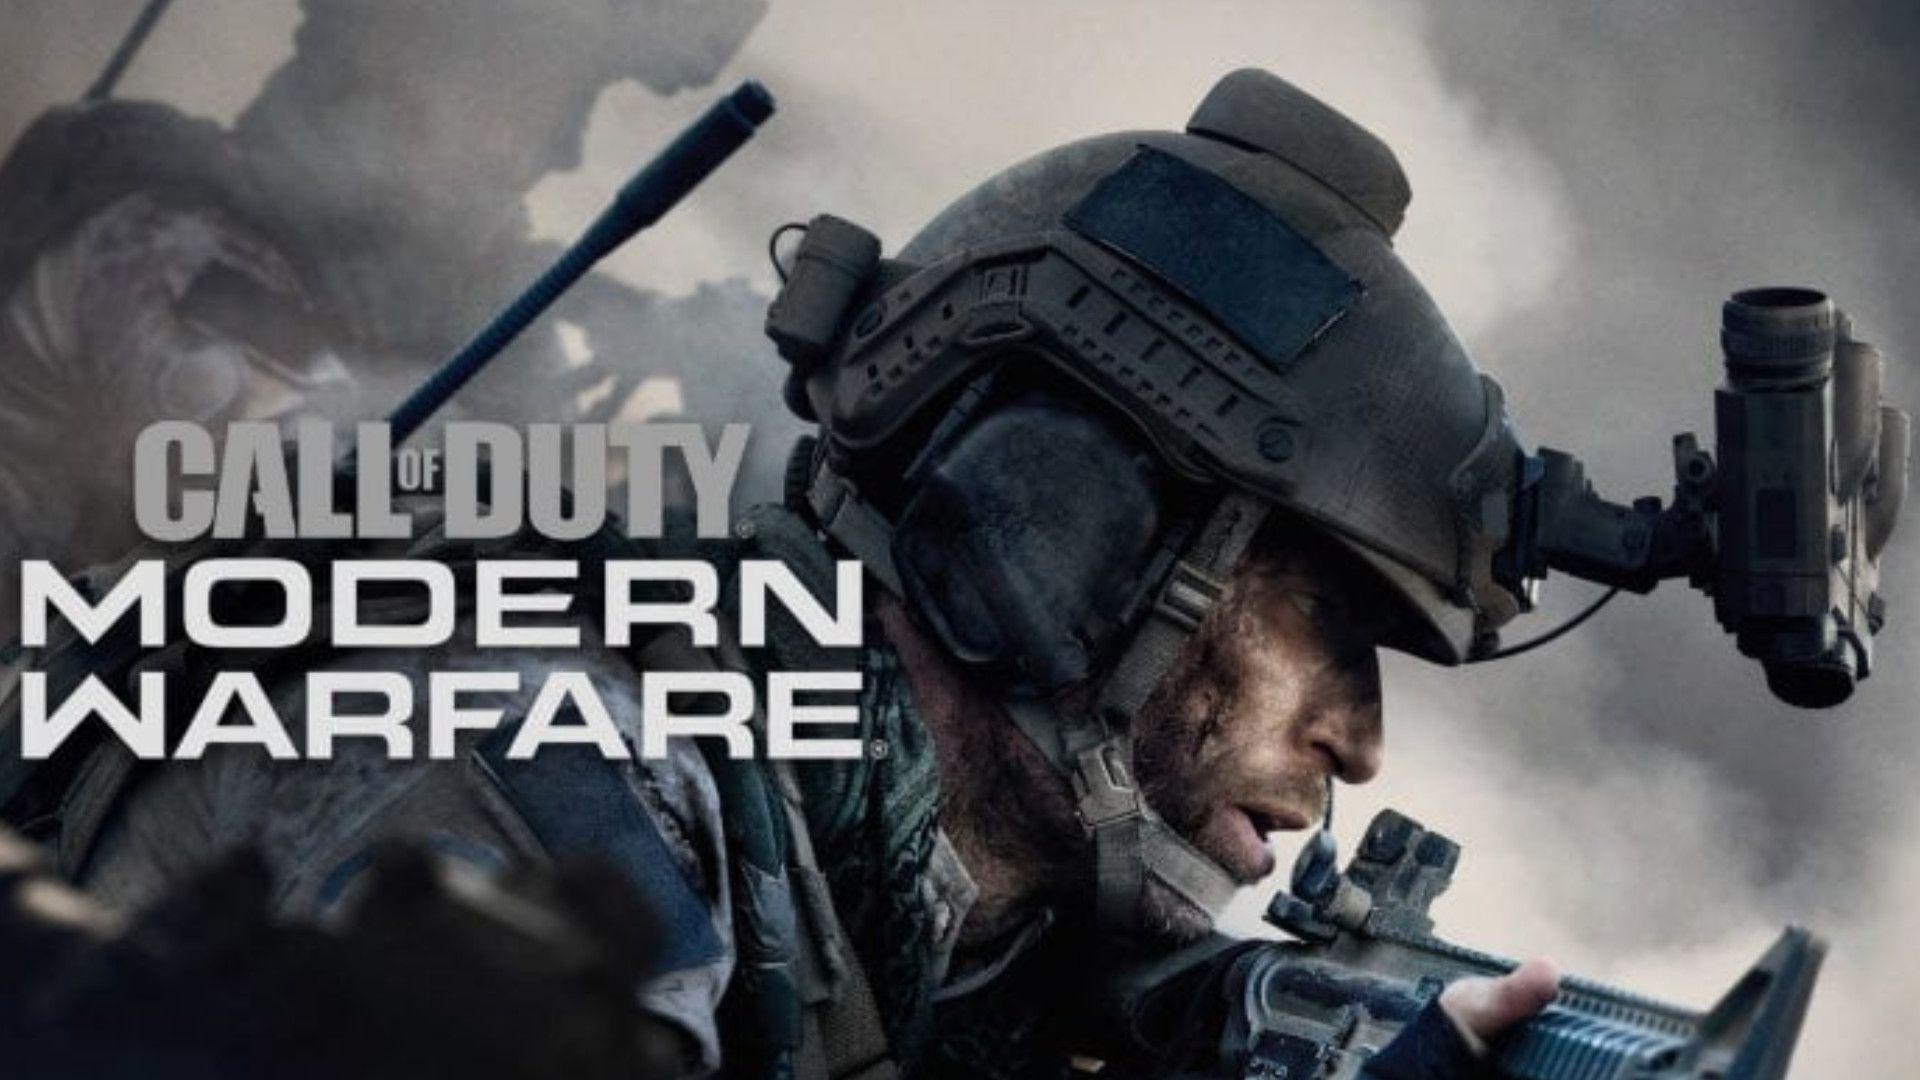 Call Of Duty Modern Warfare HD Wallpapers - Wallpaper Cave